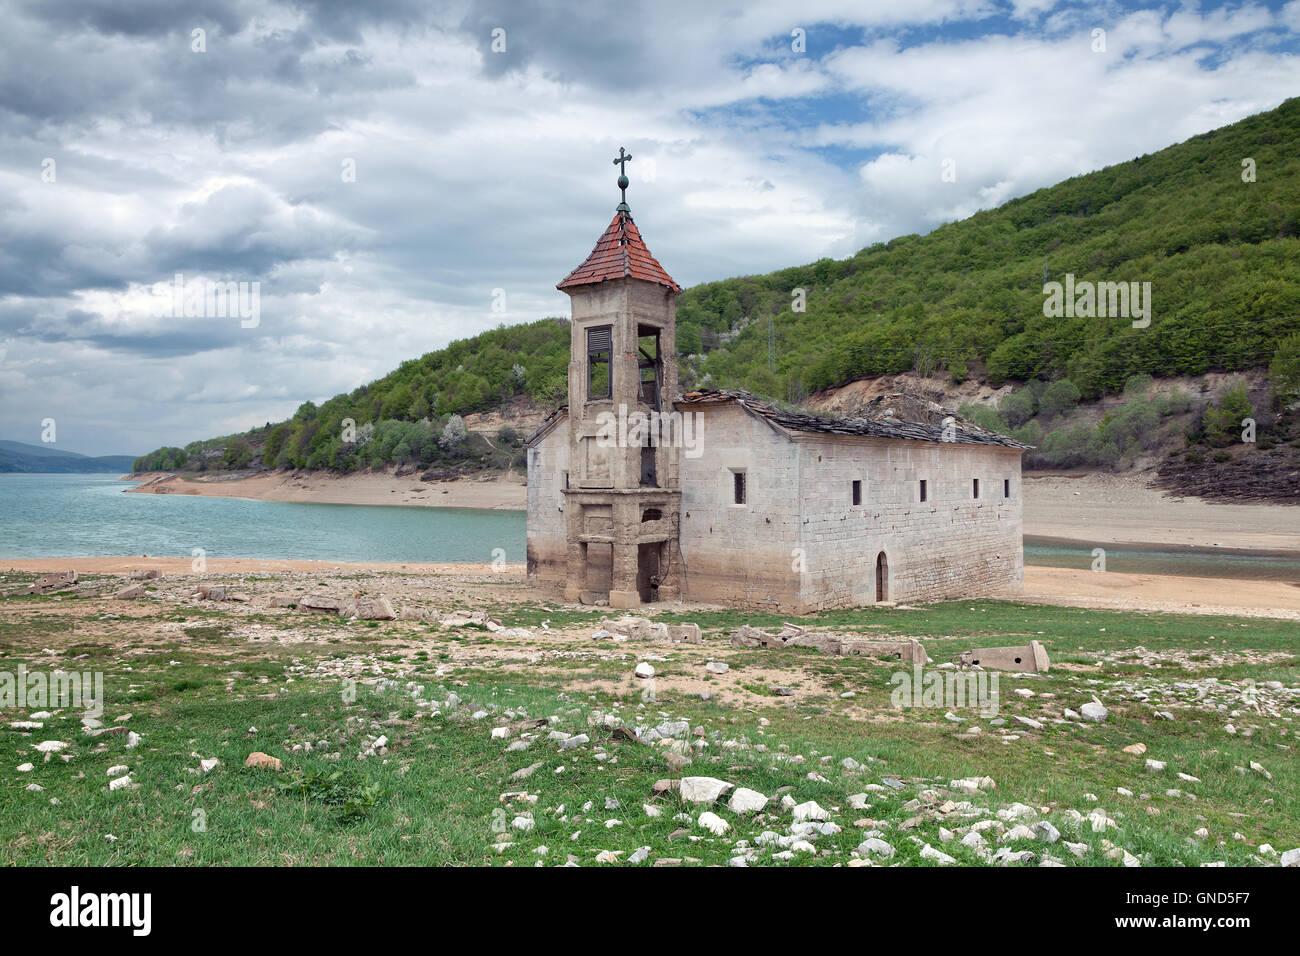 Old ruined church by the Mavrovo Lake, Macedonia - Stock Image